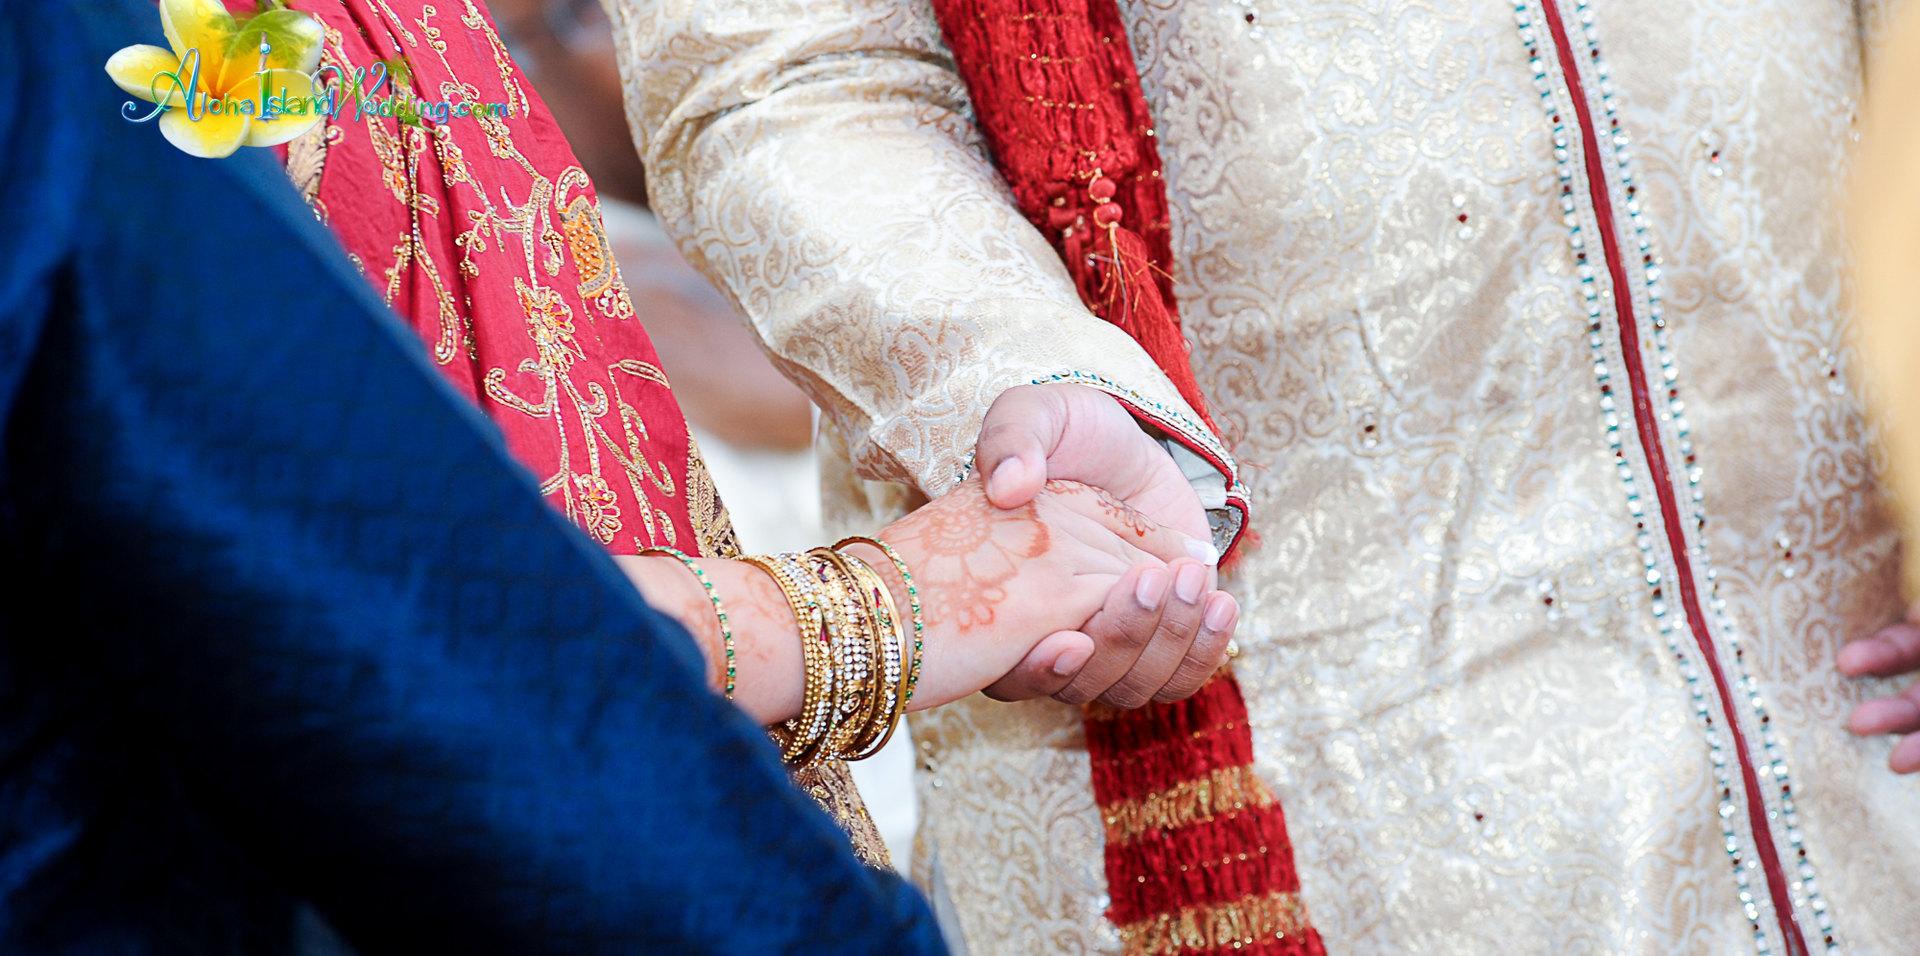 Indian wedding ceremony in hawaii-84.jpg